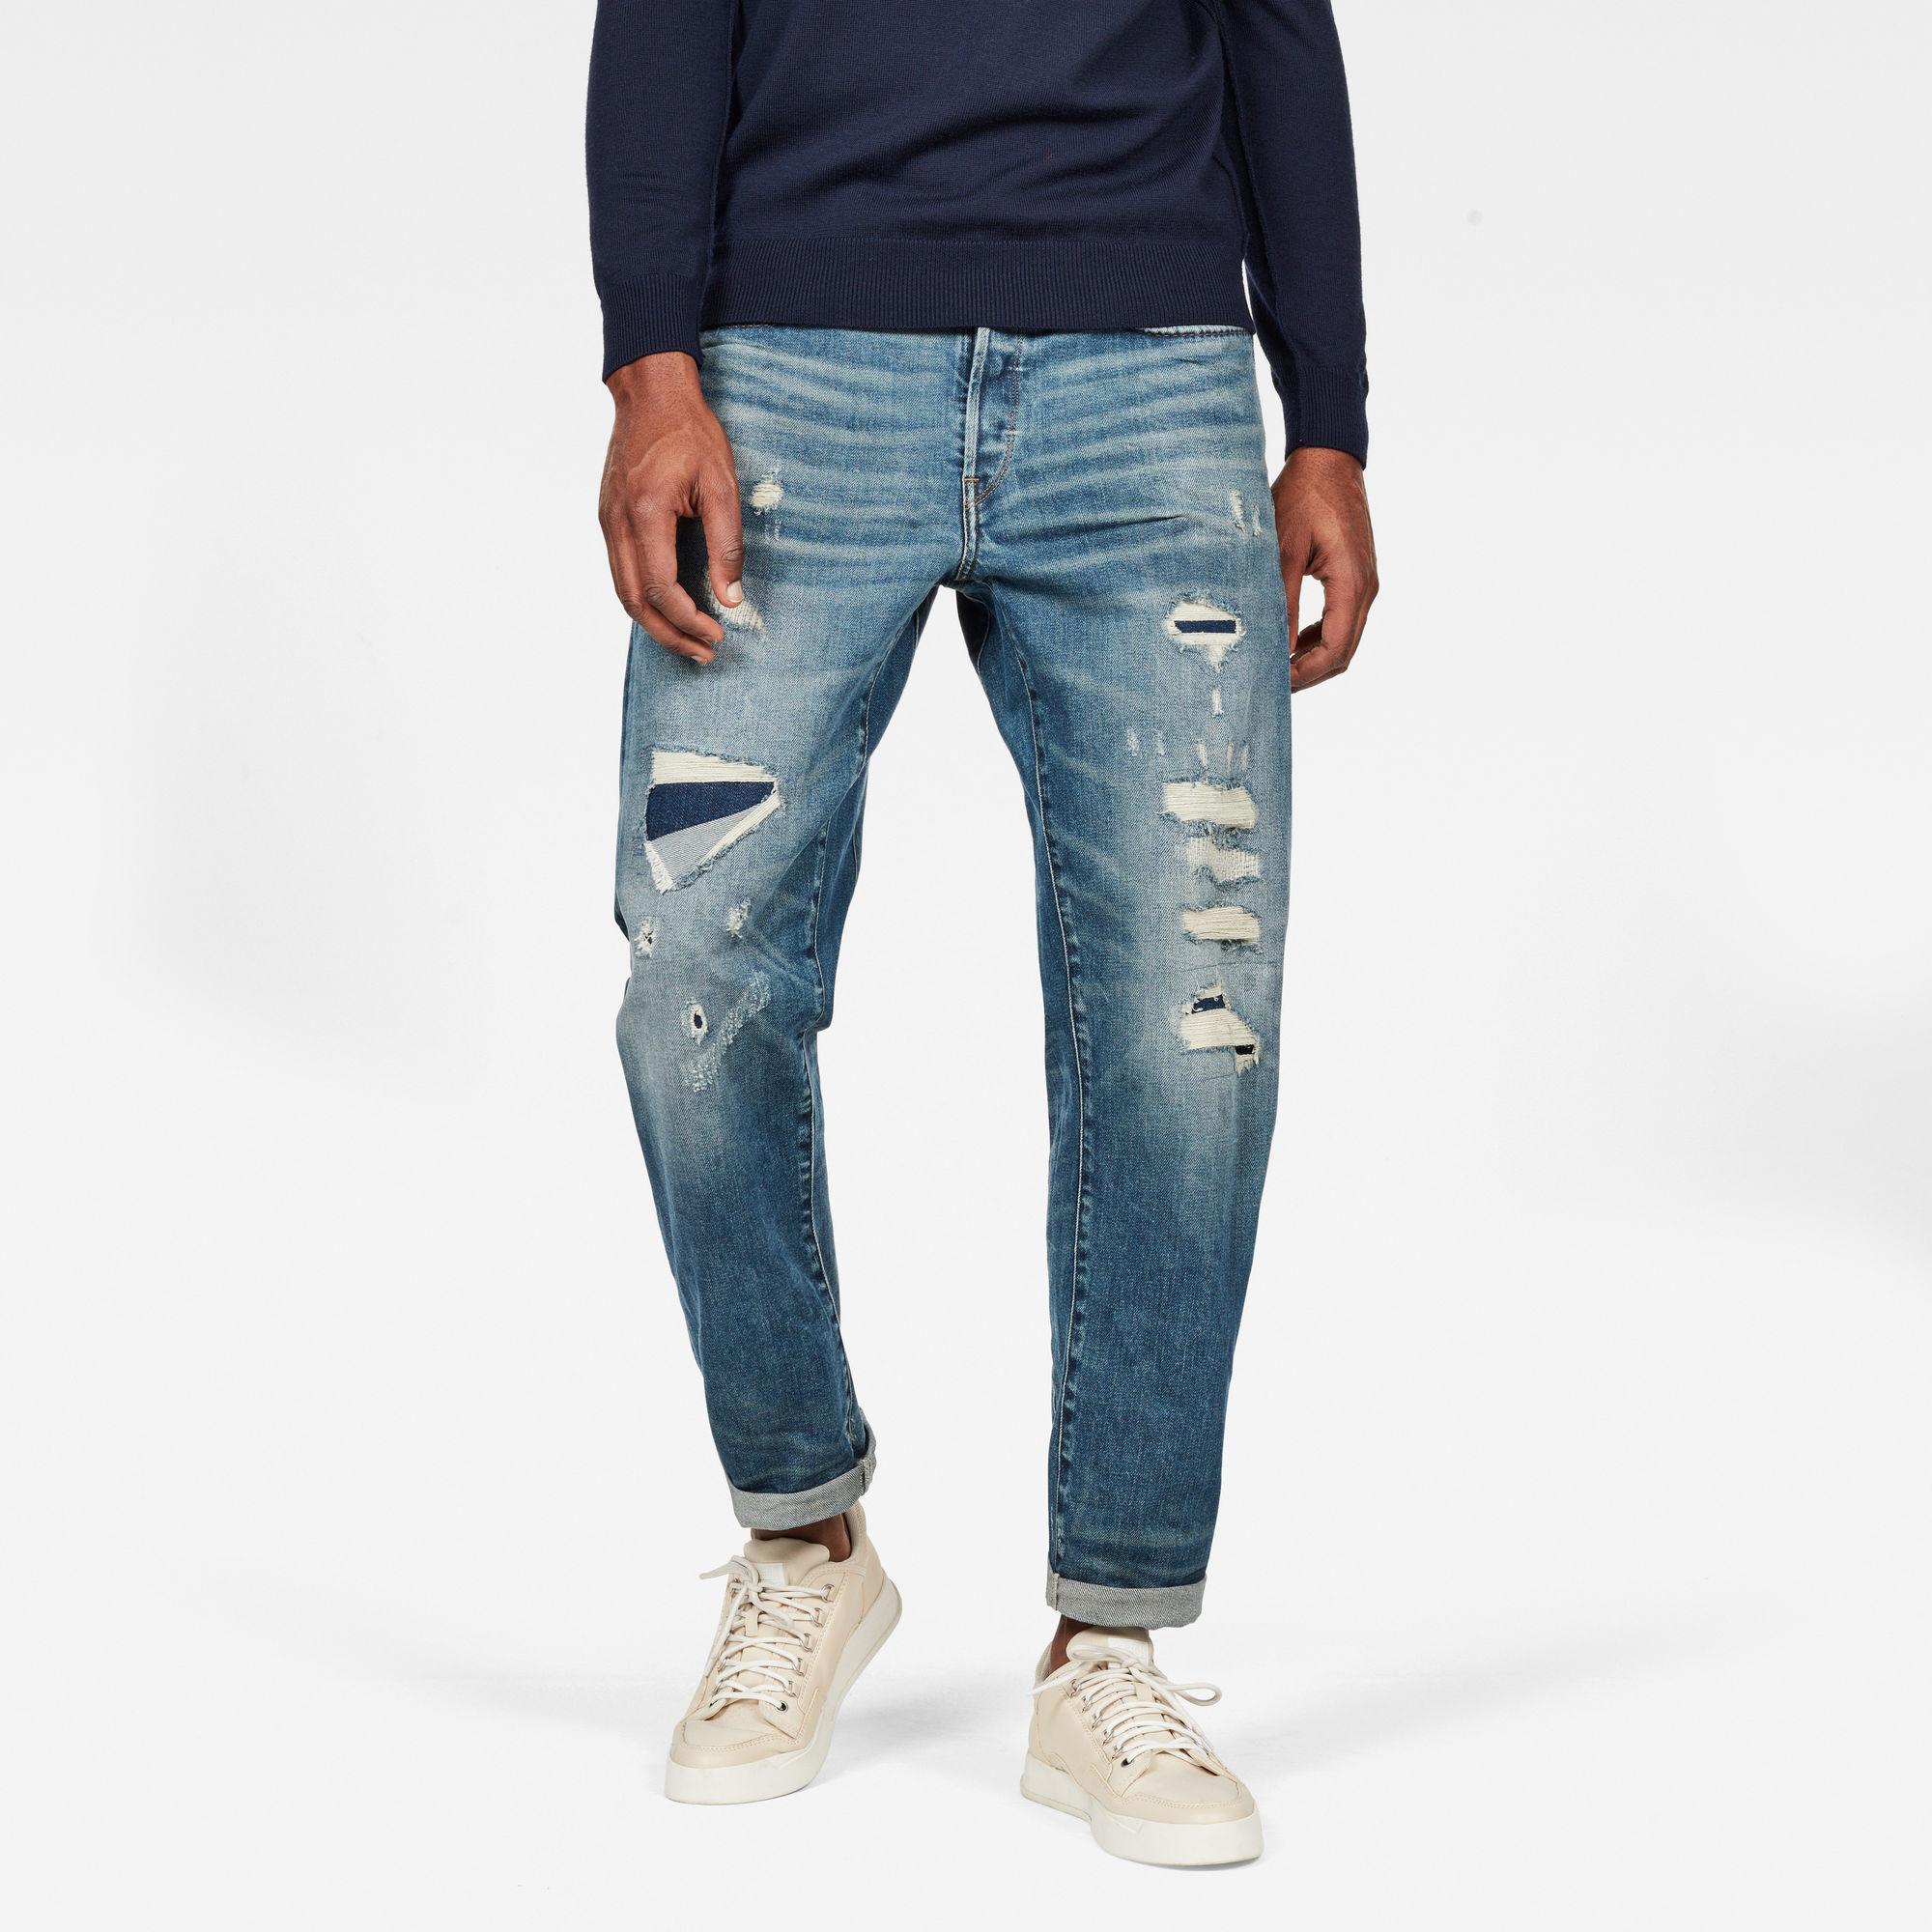 Moddan Type C Relaxed Tapered Jeans kopen Midden blauw